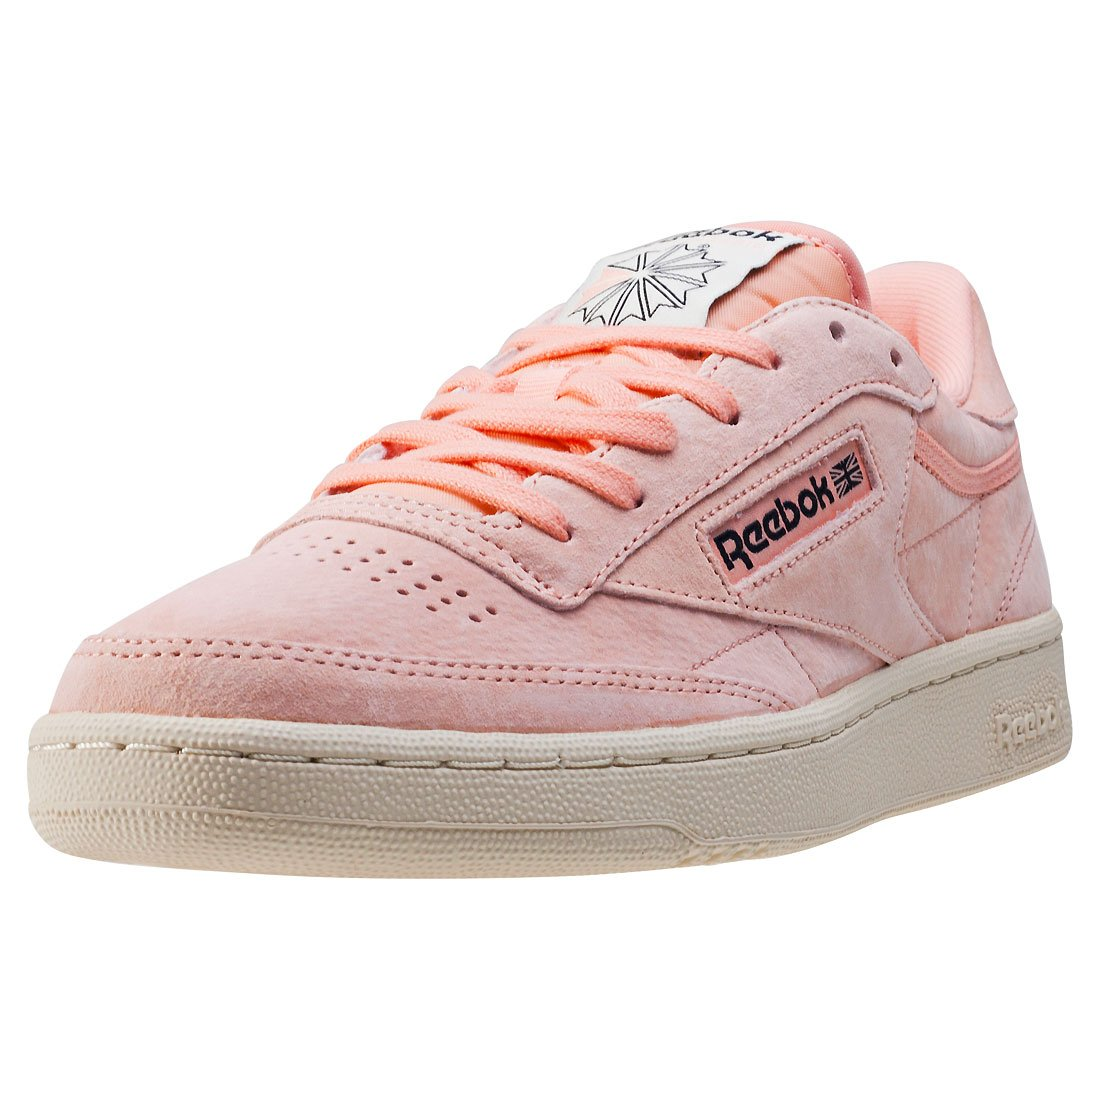 Reebok Club C 85 Pastels Mauml;dchen Sneaker Pink  405 EU|Pink (Pastels Desert Stone/Paperwhite)